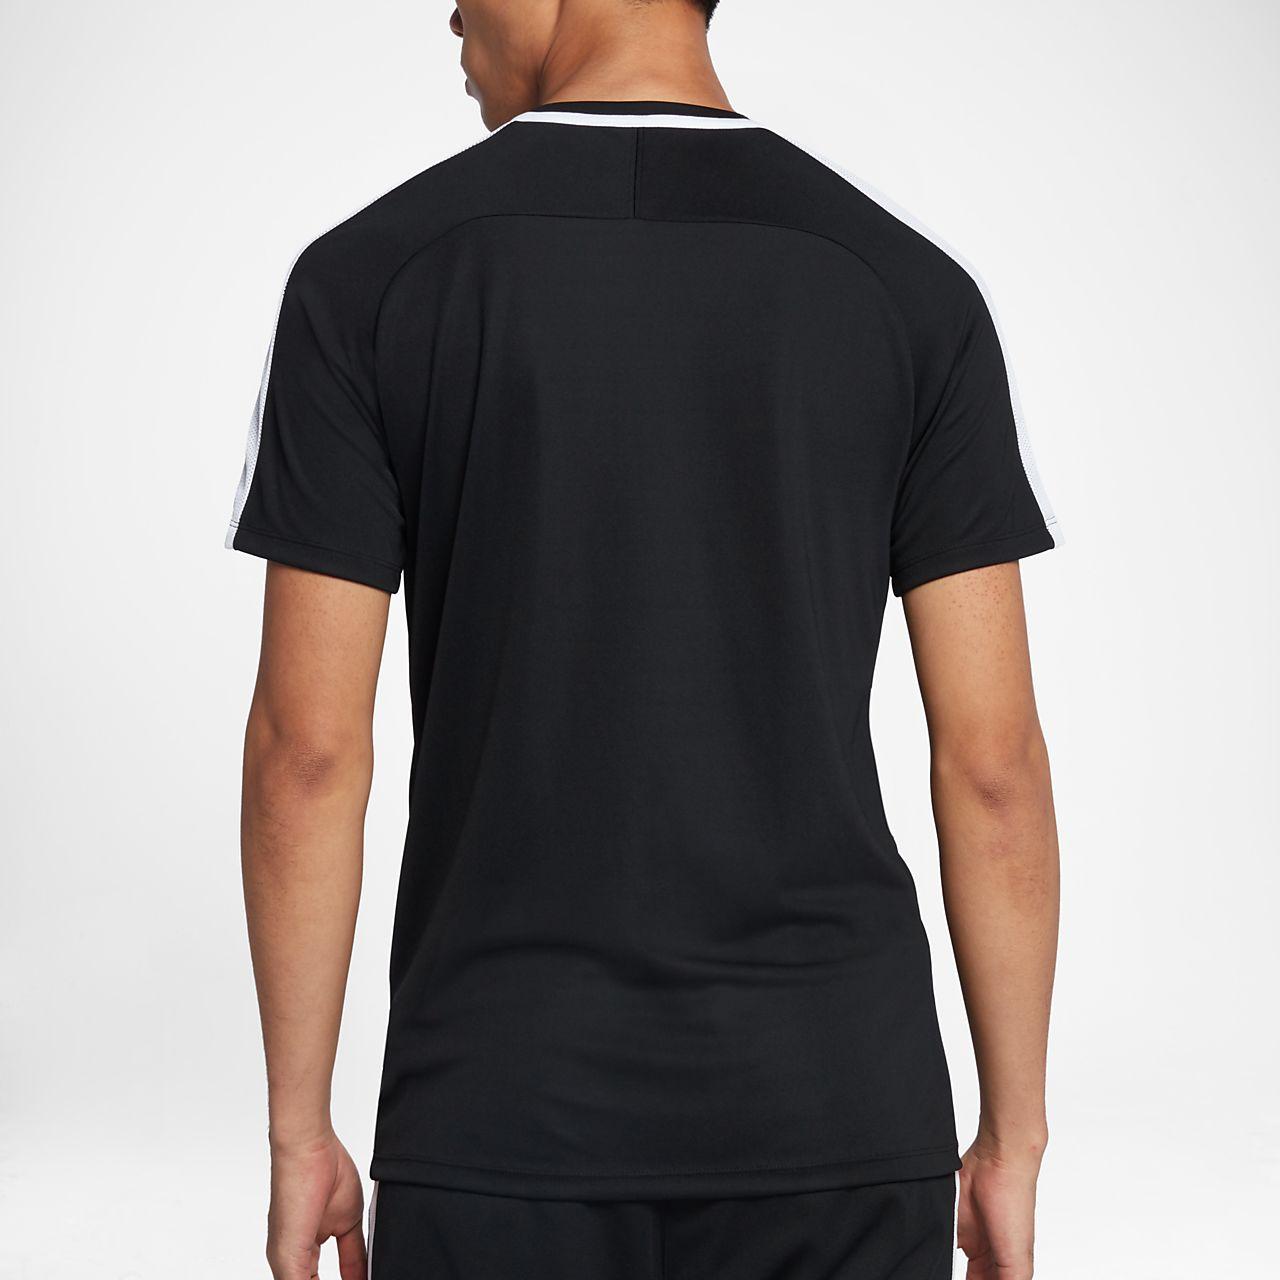 ... Nike Dry Academy Men's Short Sleeve Football Top